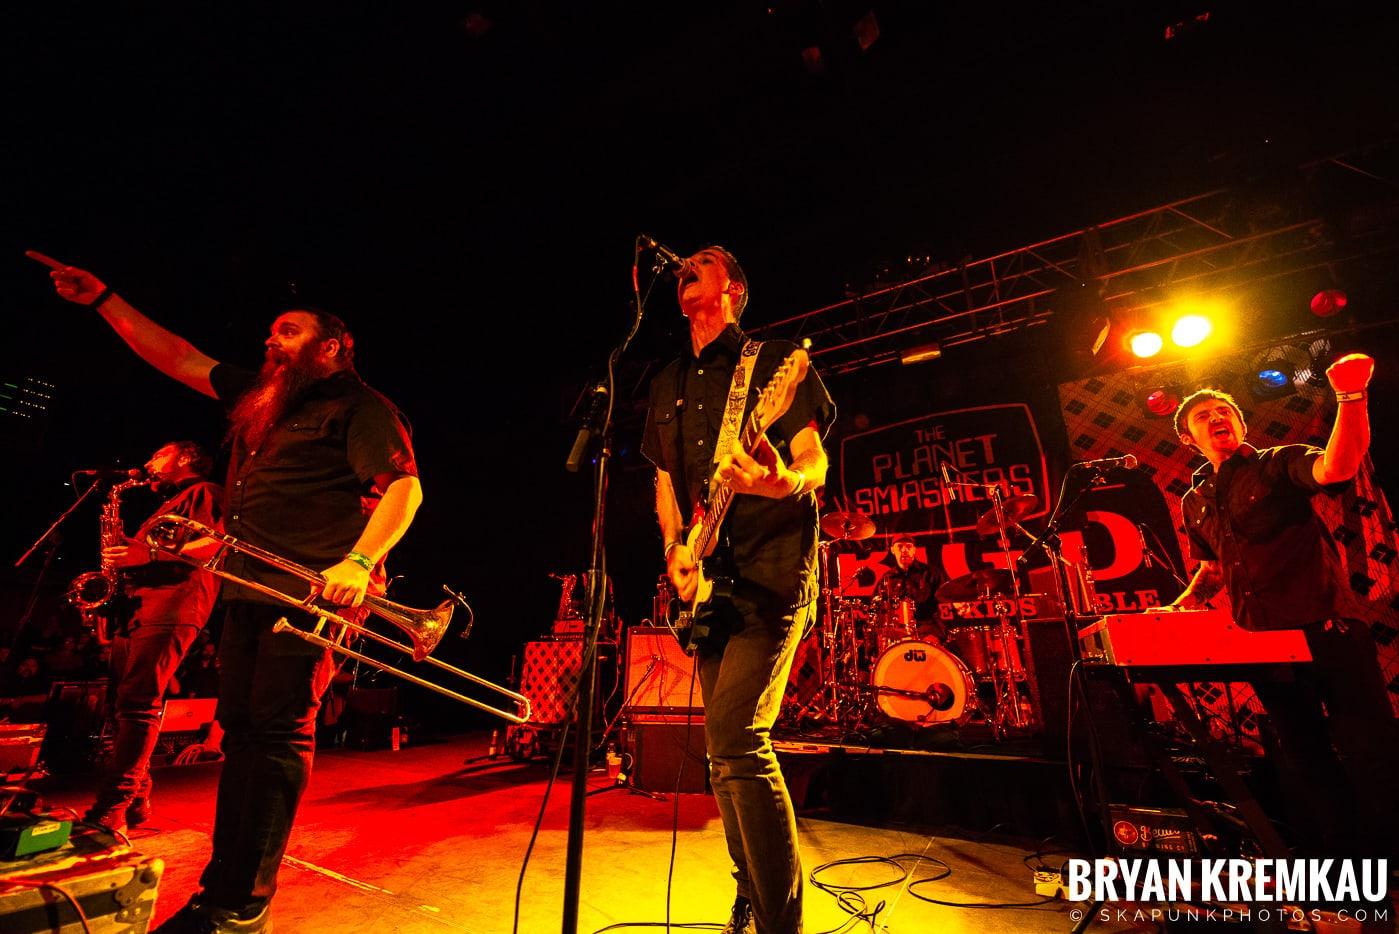 The Planet Smashers @ Skanksgiving, Starland Ballroom, Sayreville, NJ - 11.30.19 (18)